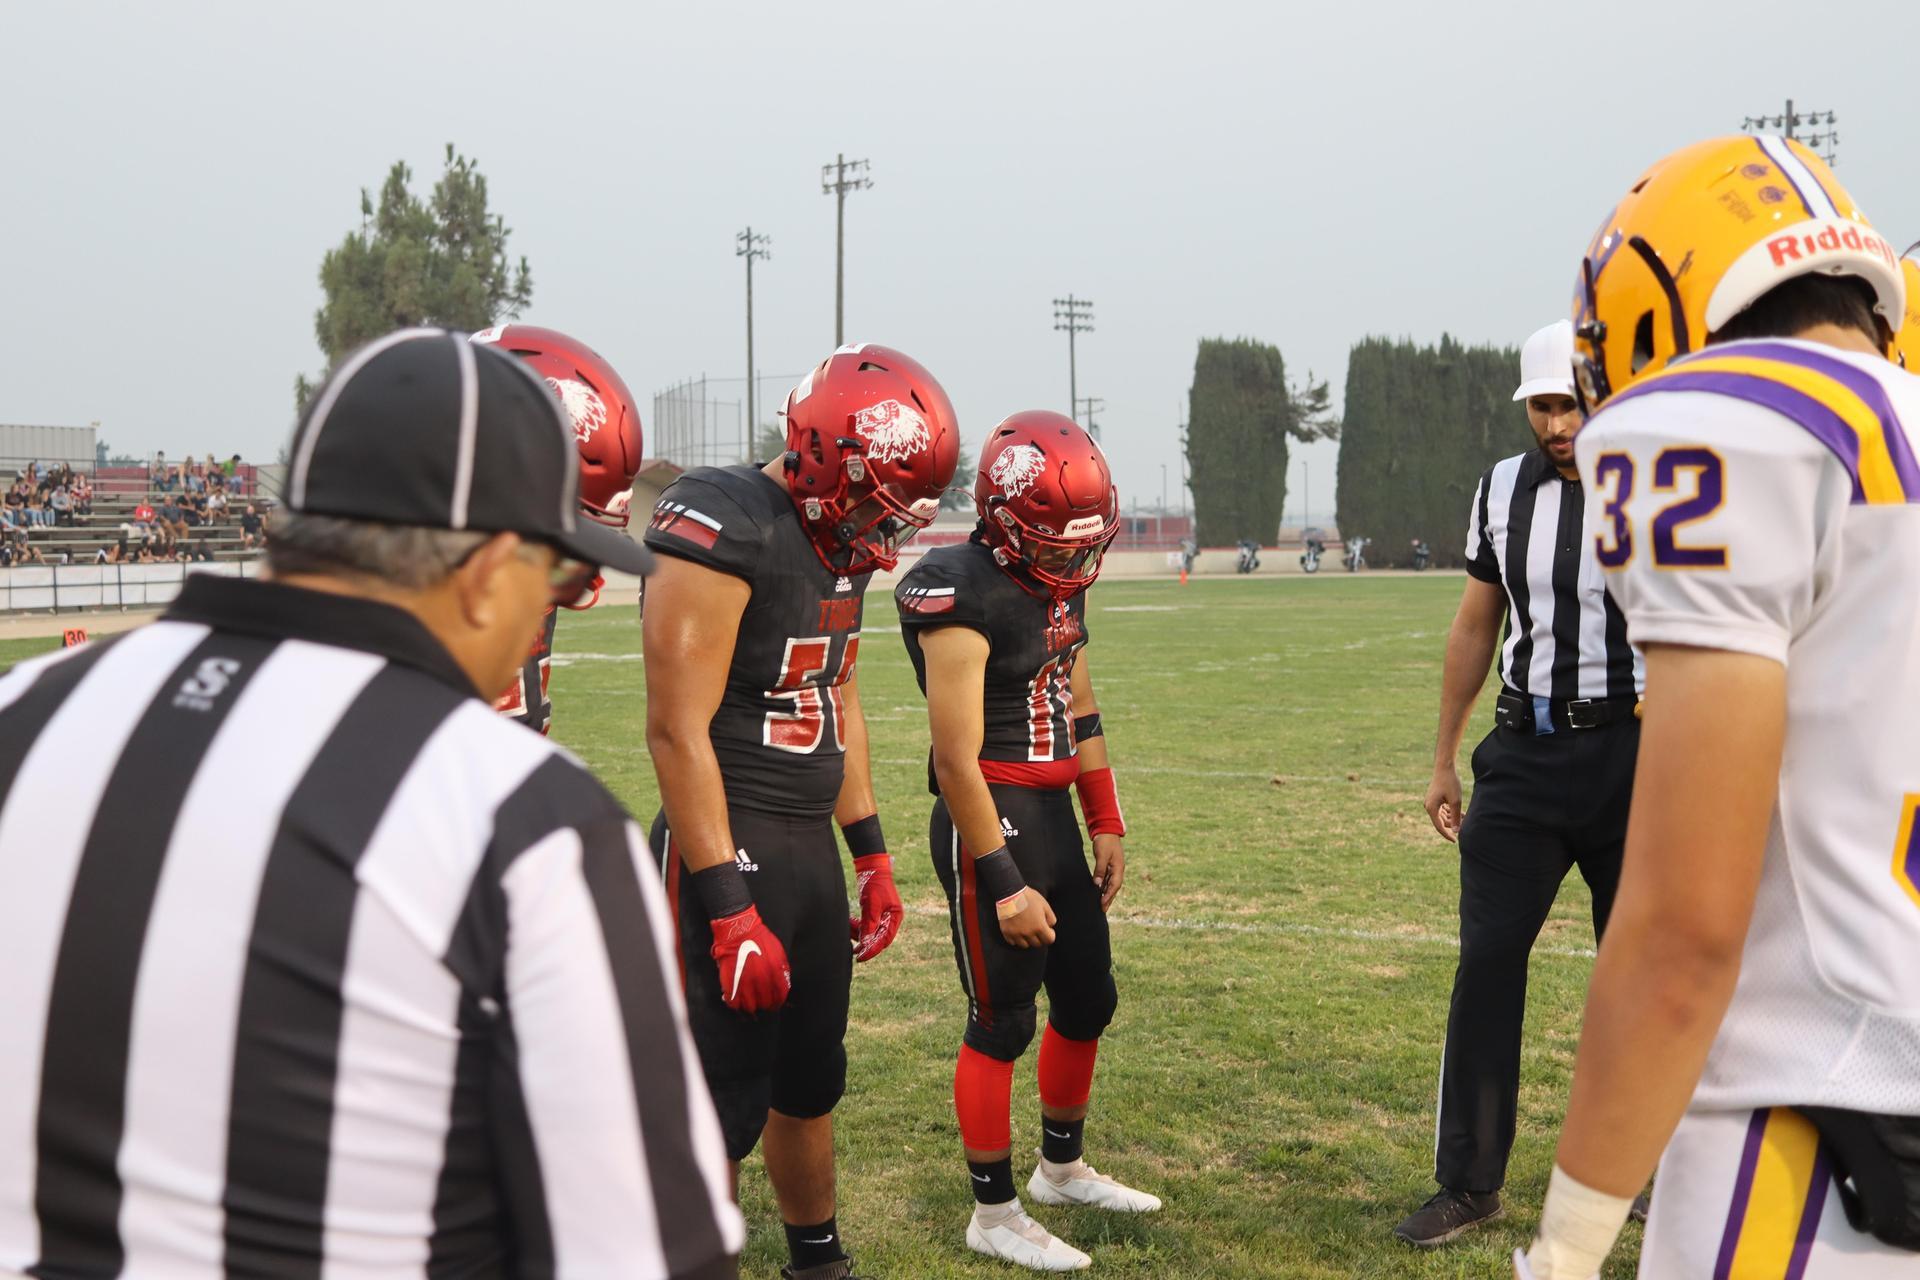 Varsity boys playing football against Lemoore